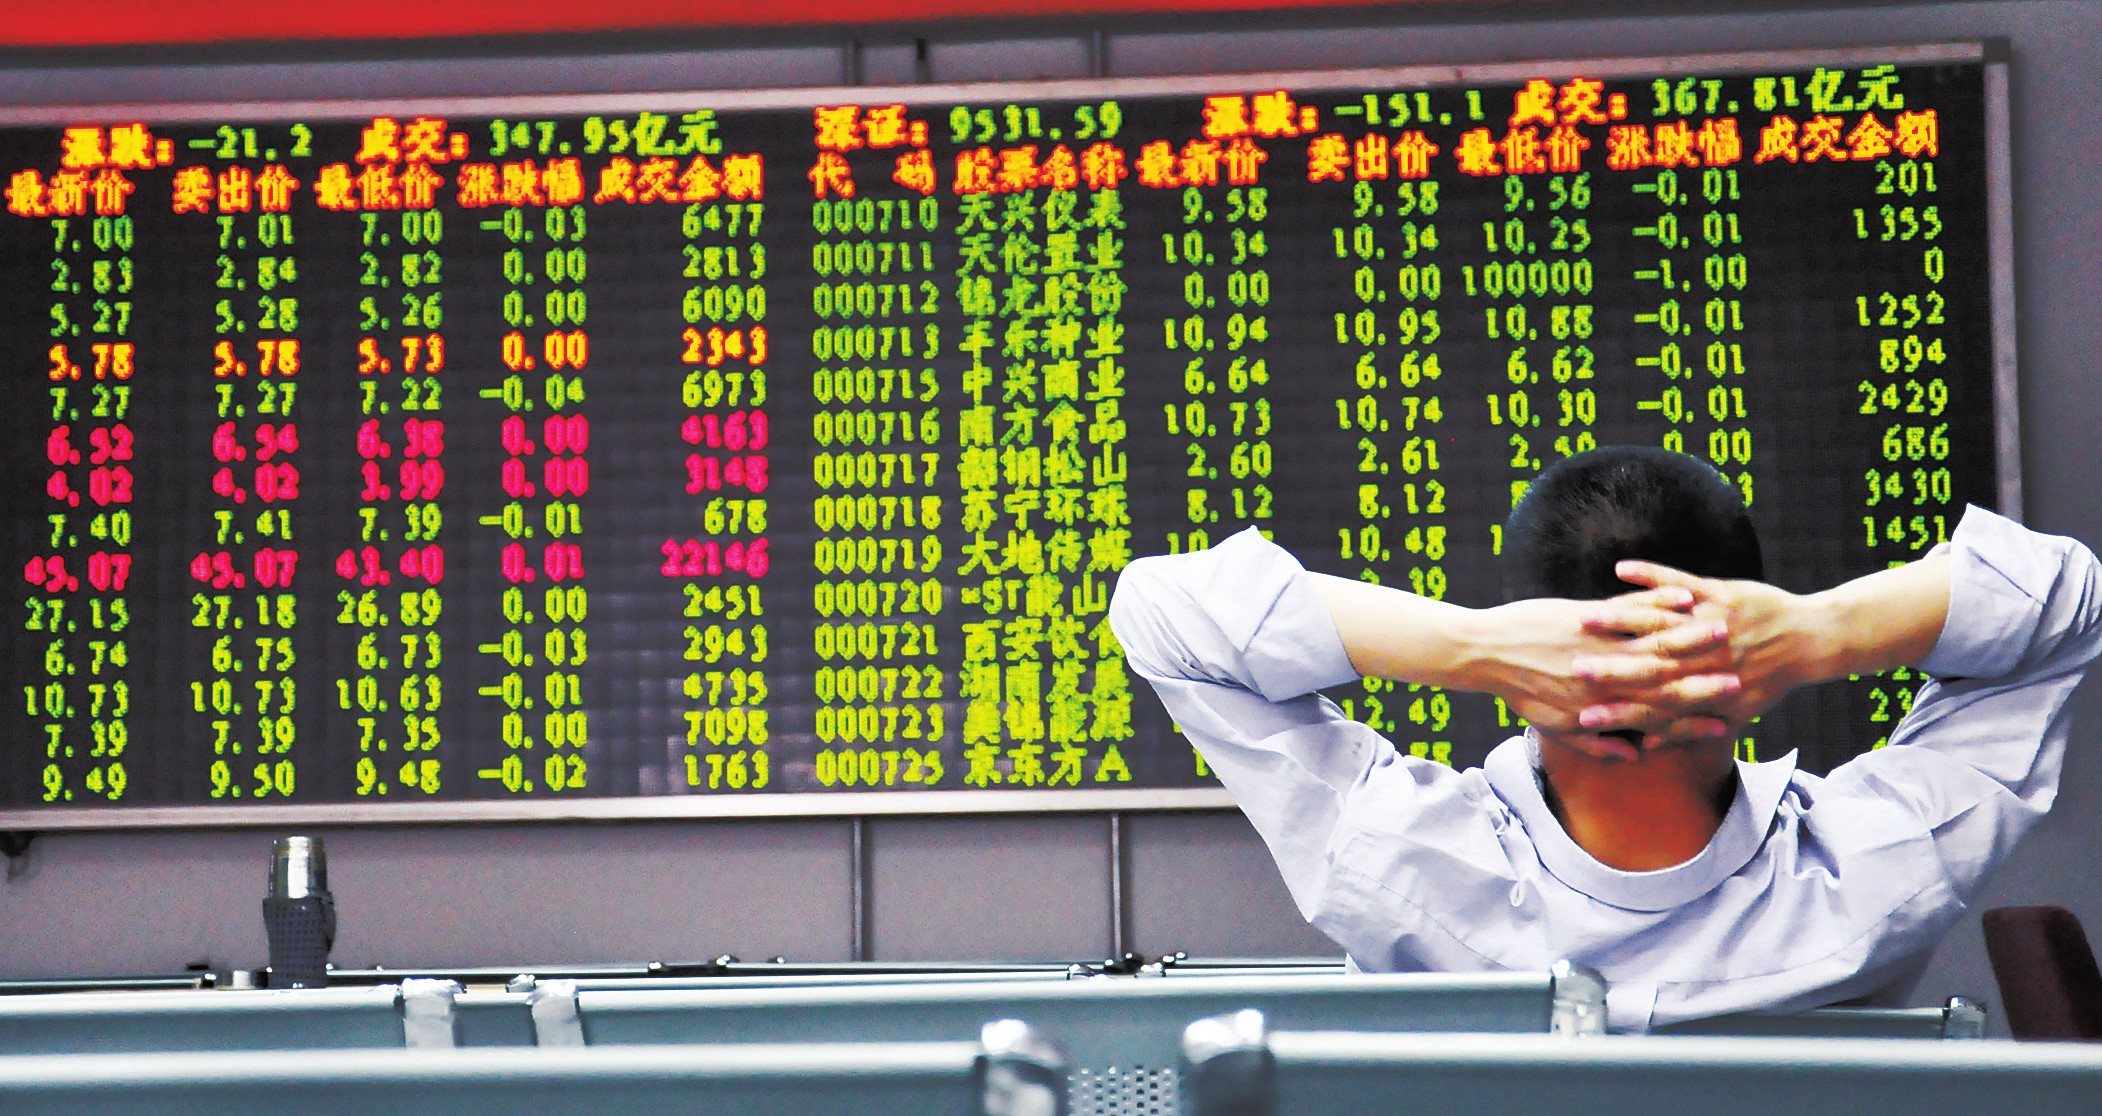 Bolsa de valores Shenzhen-Shanghai